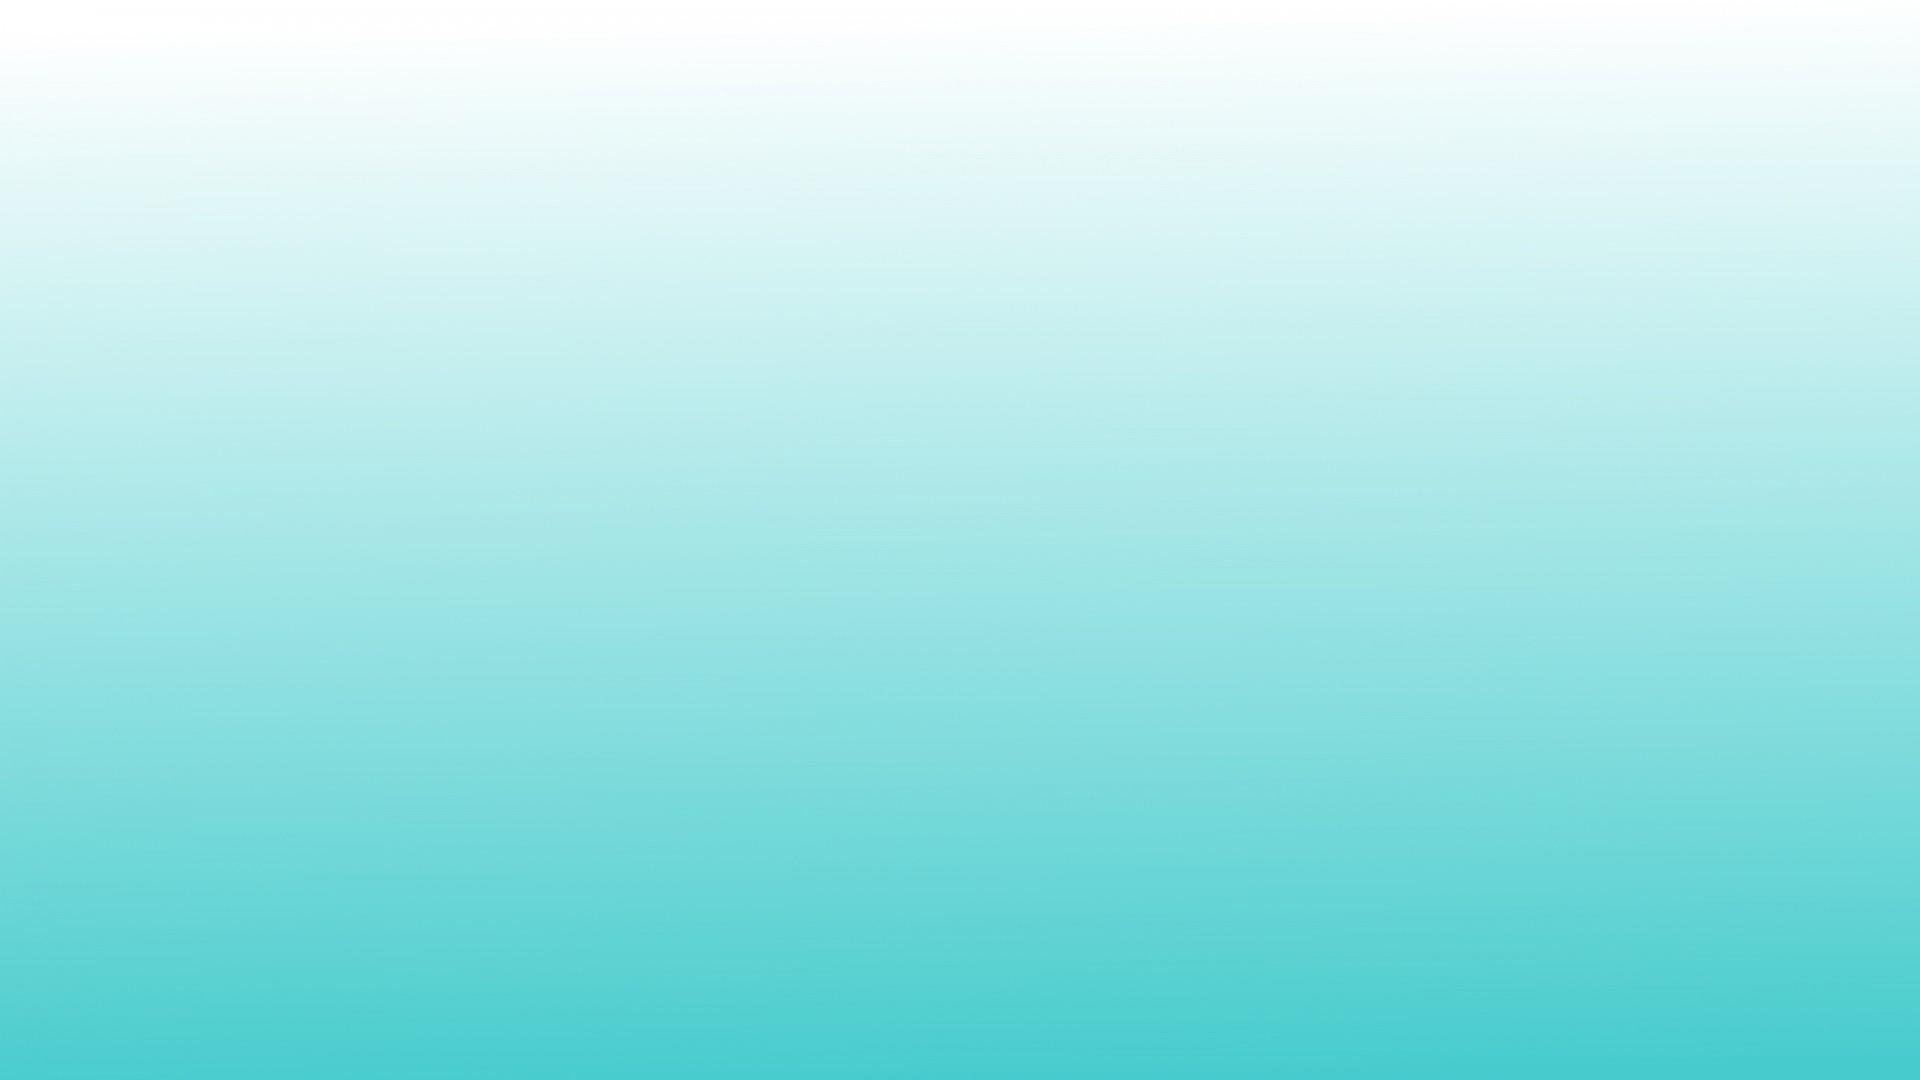 turquoise-top-gradient-background.jpg